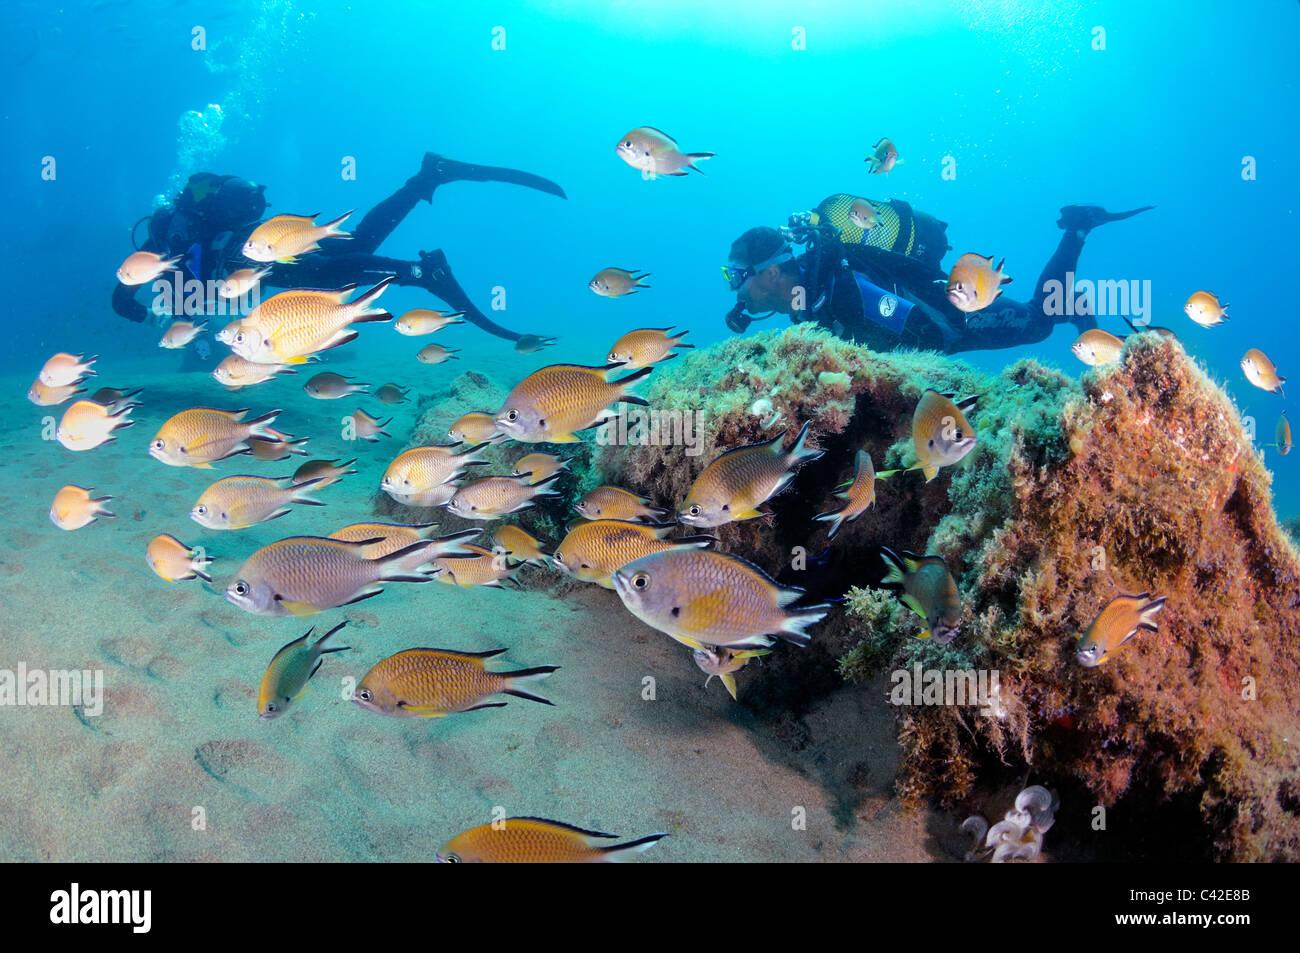 Atlantic Riffbarsche, Chromis Limbatus mit Taucher im Hintergrund, Lanzarote Stockbild